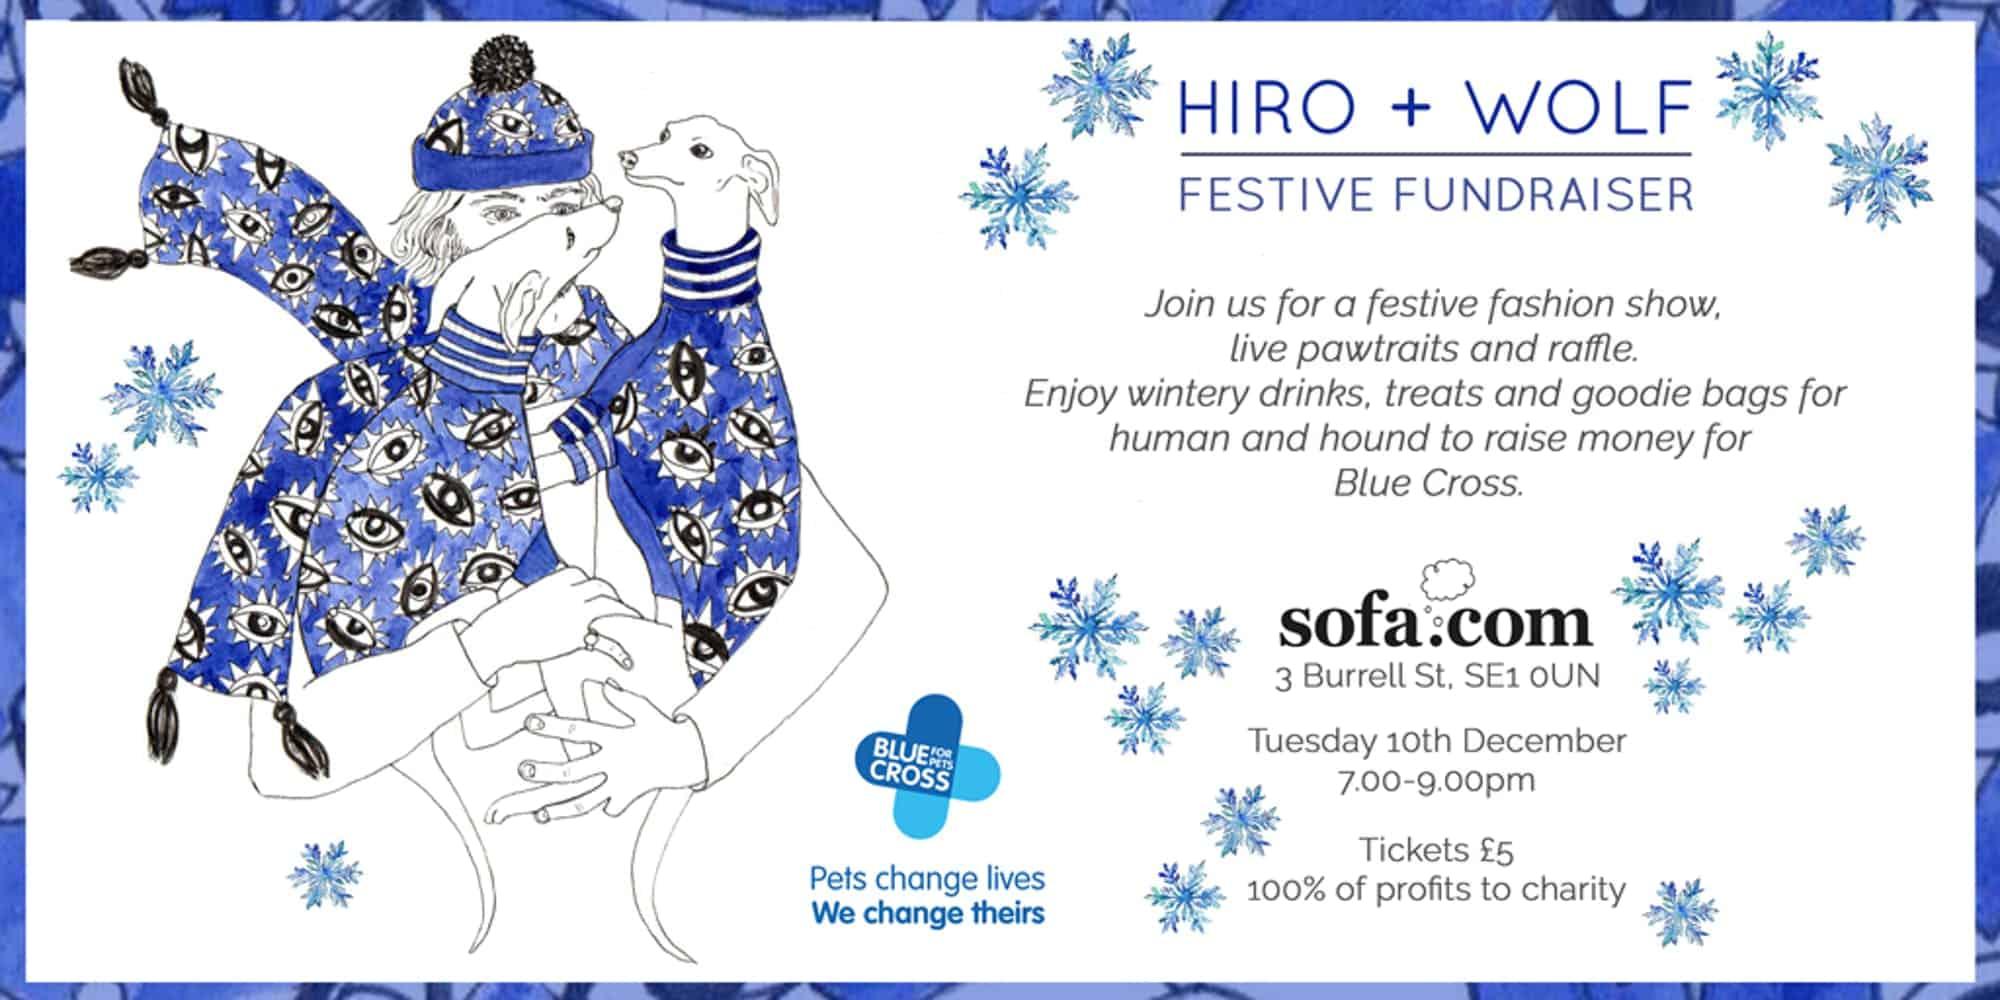 Hiro + Wolf Festive Fundraiser 2019